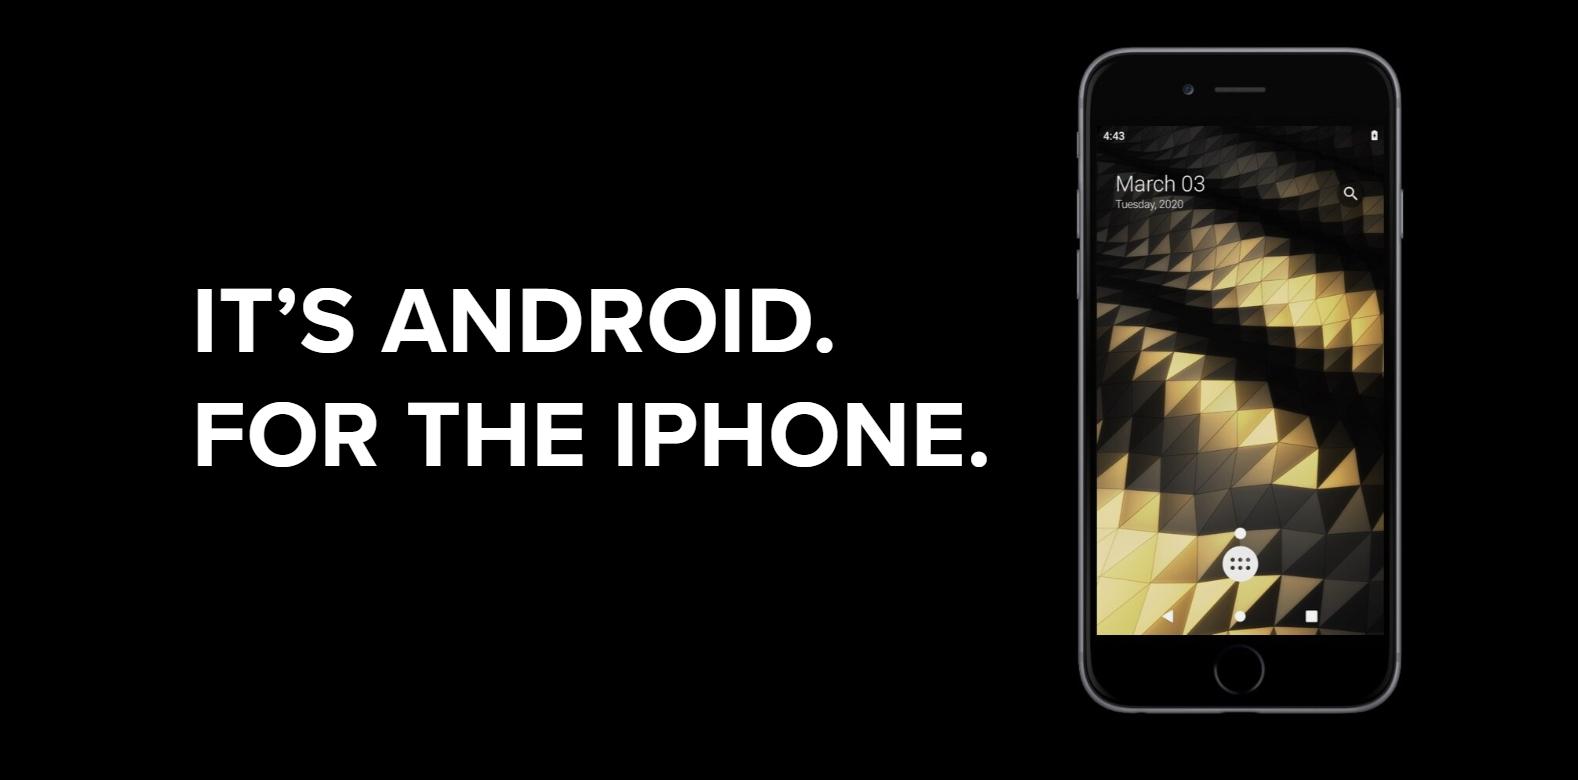 Nový jailbreak umožnuje spustit Android na iPhone 7